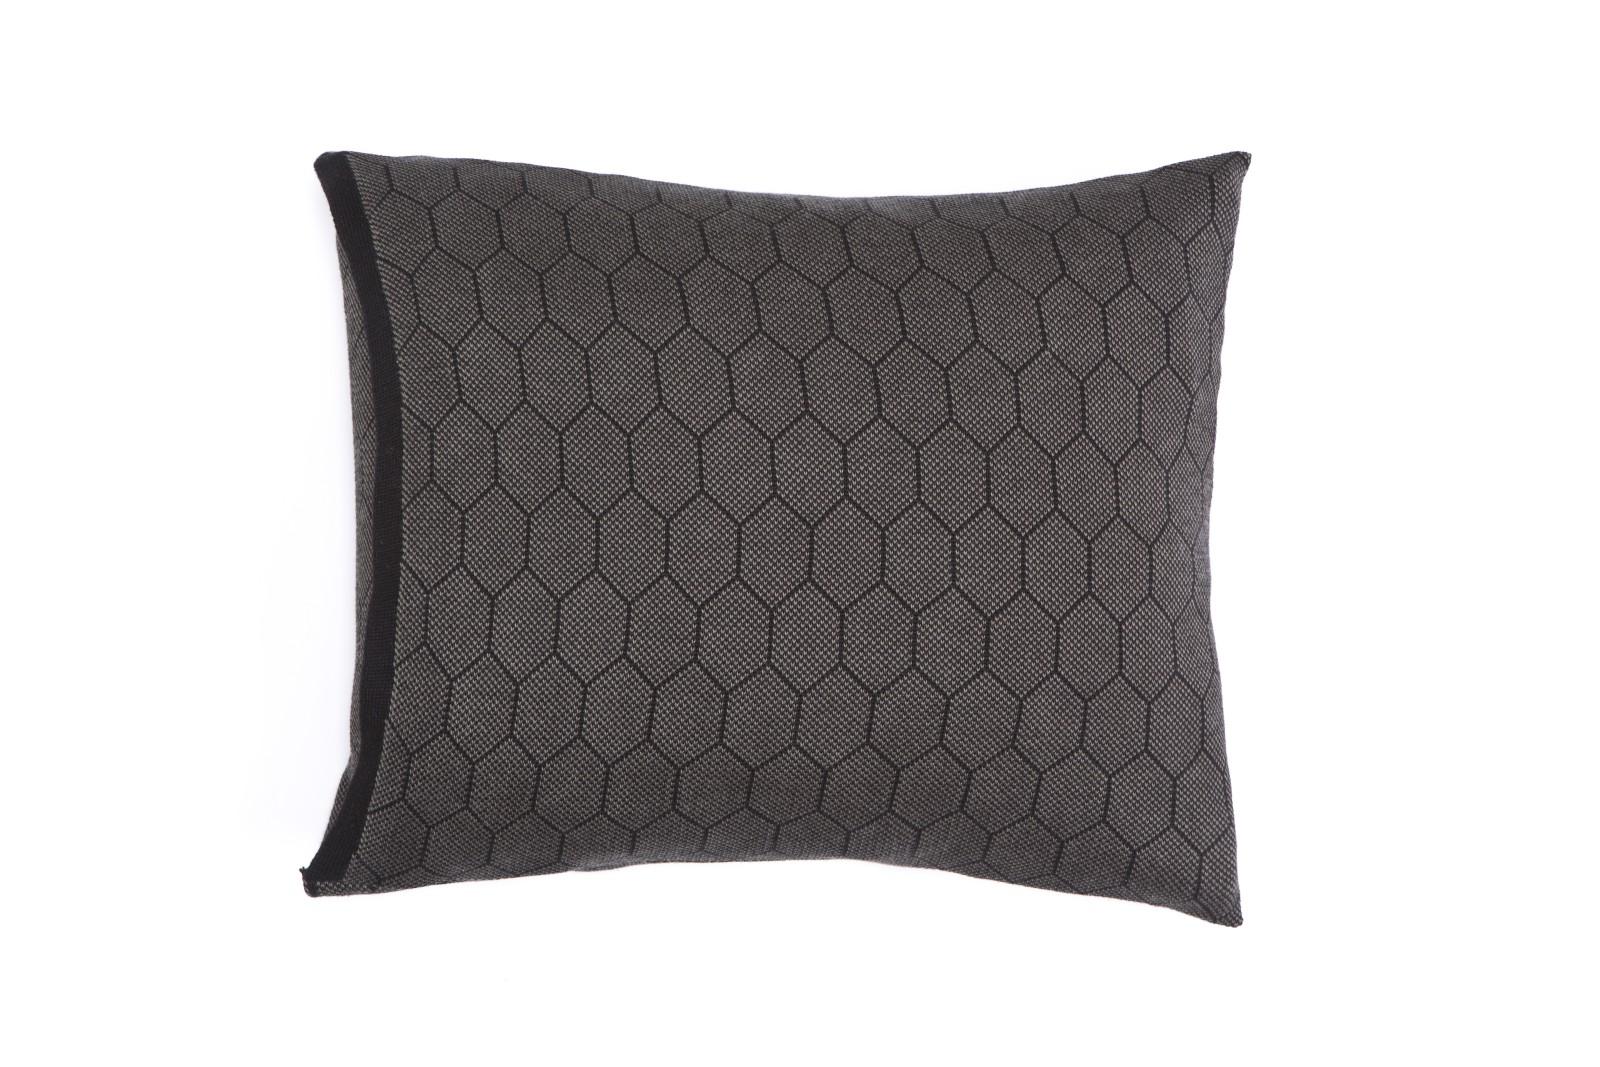 Honeycomb Knitted Cushion Hive Black & Grey